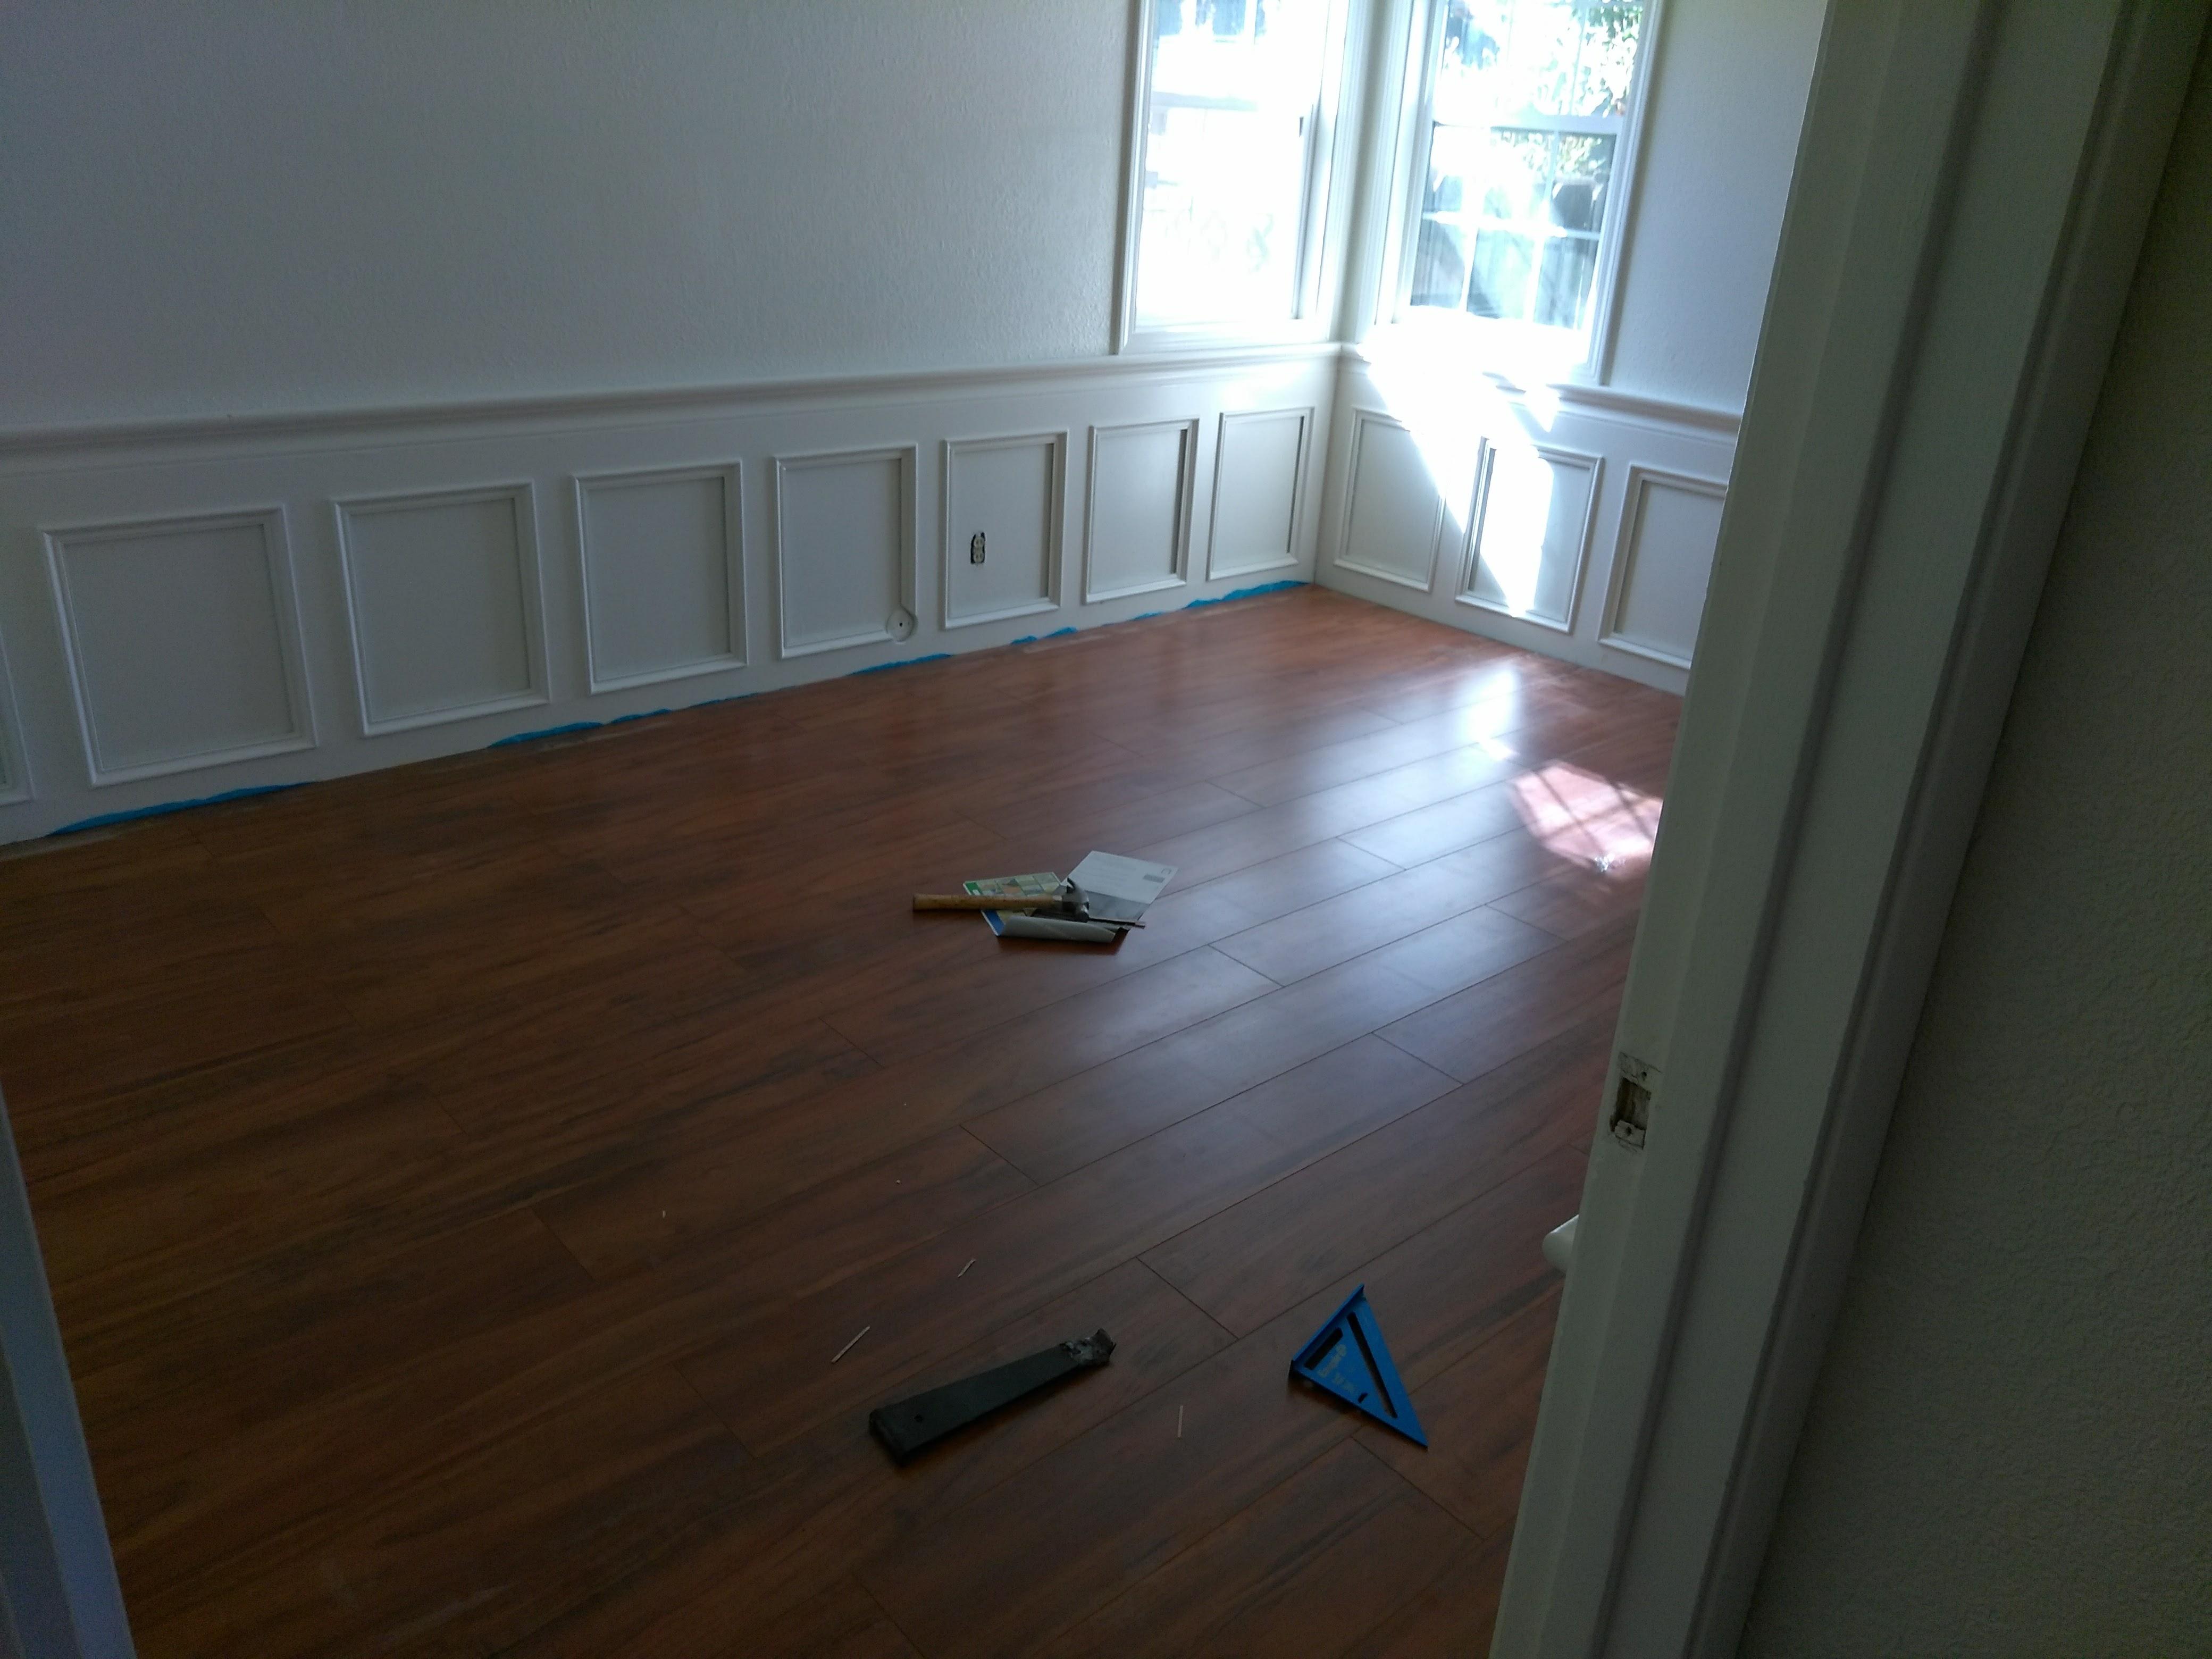 modesto laminate flooring